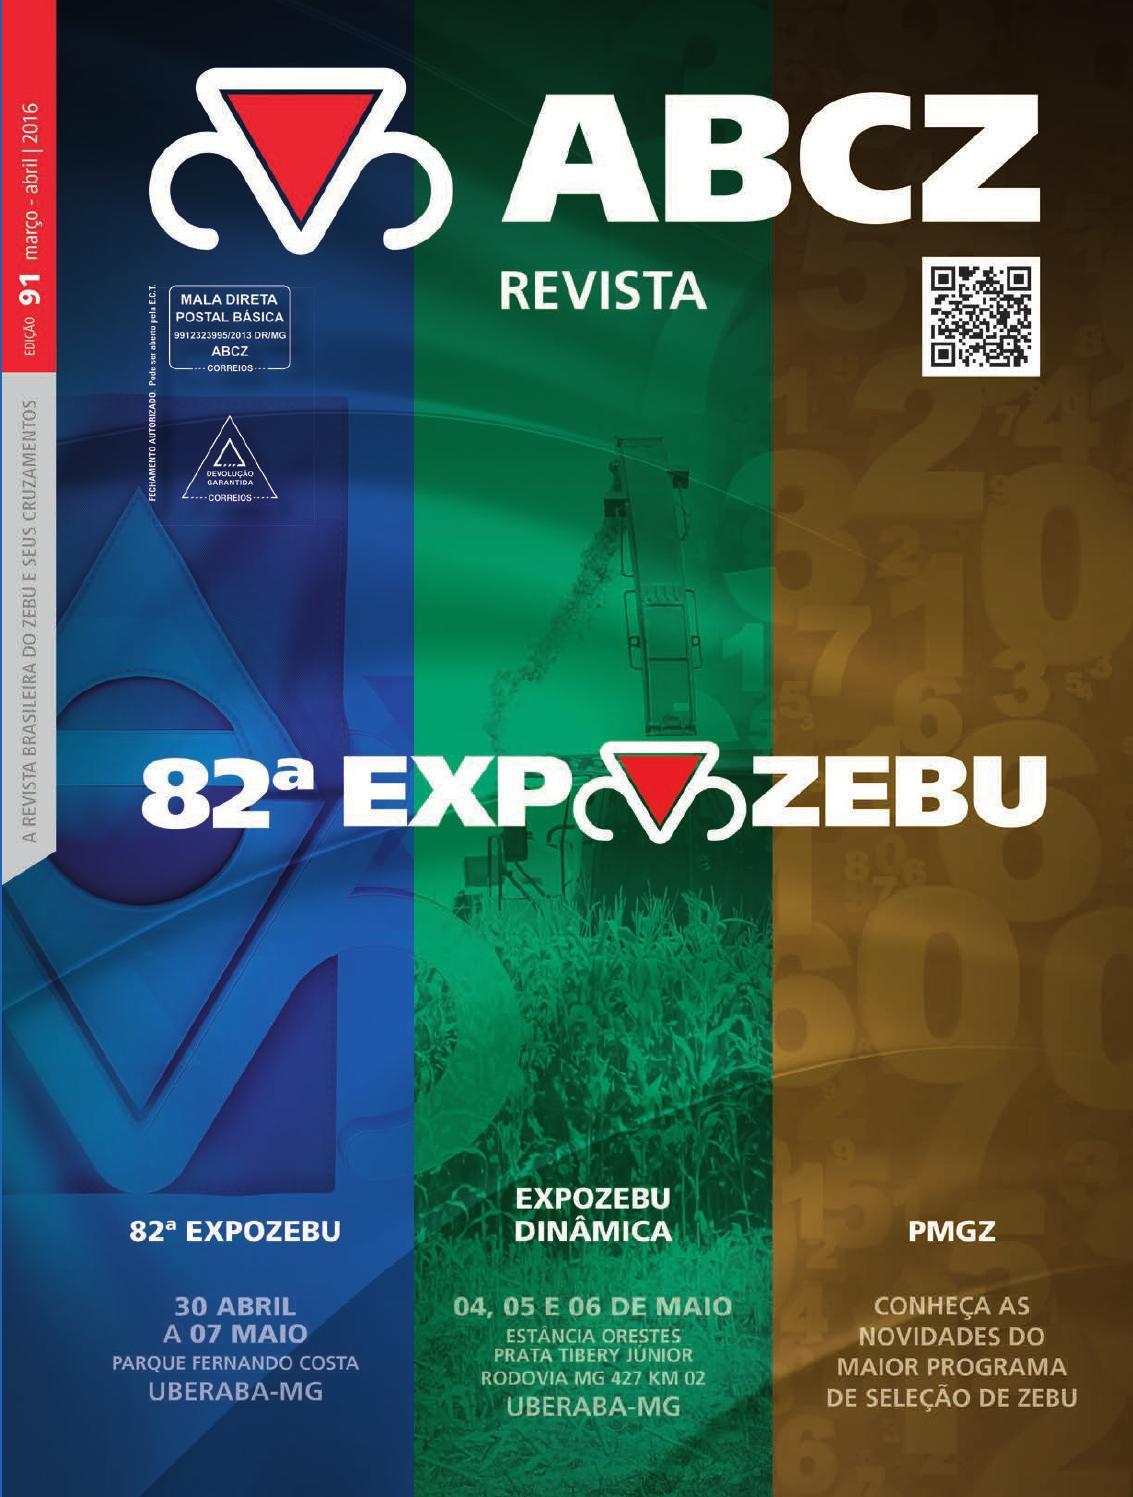 Revista ABCZ - Edição 91 by ABCZ - issuu c97a1d74dab7d